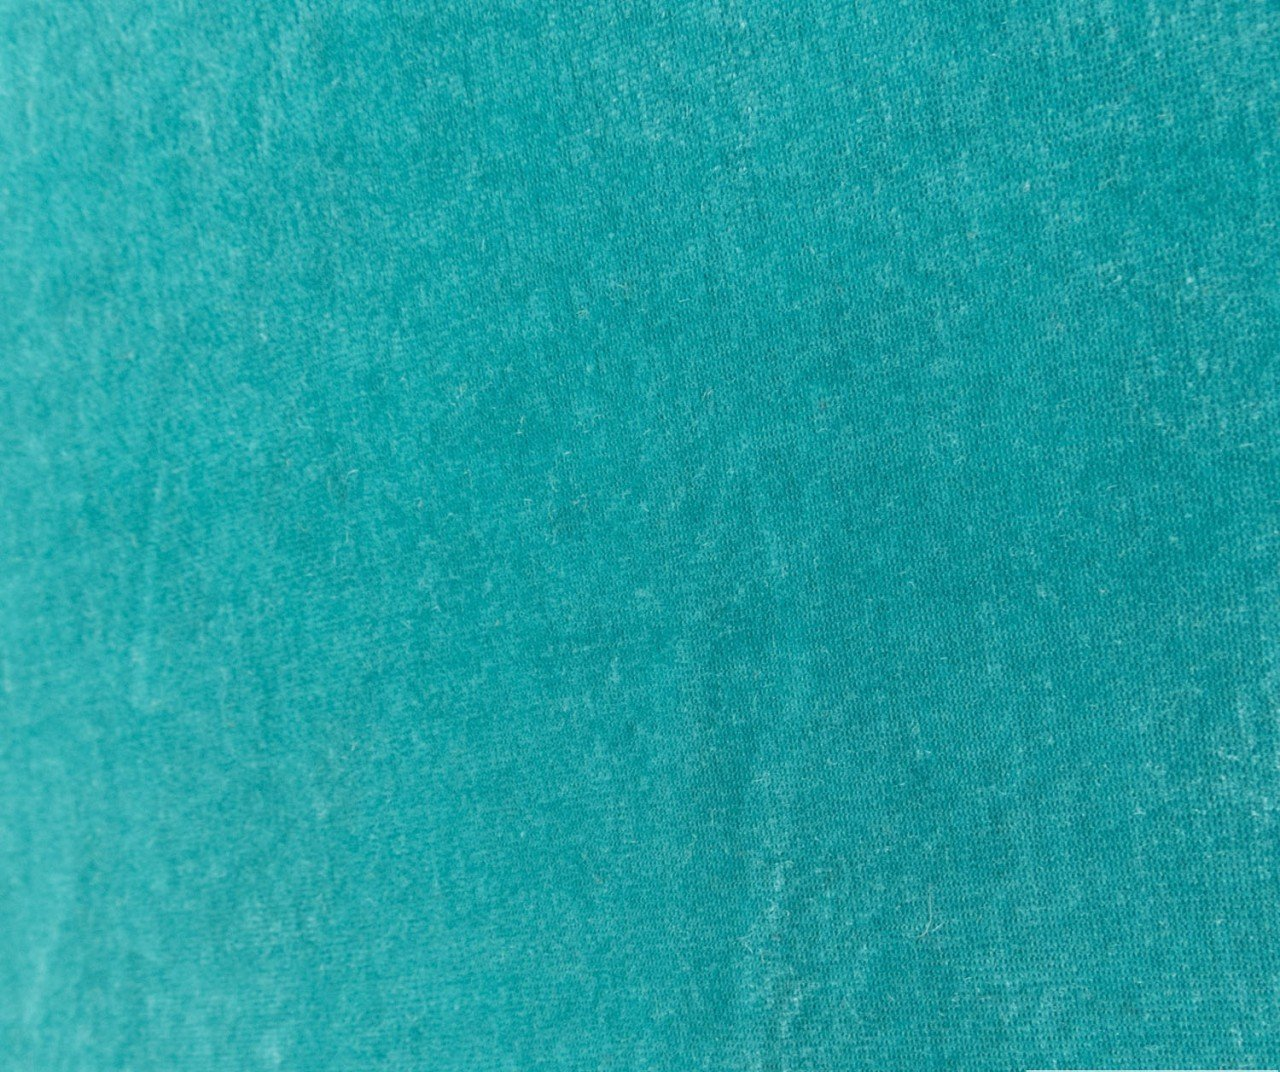 Aquamarine Stretch Velvet Fabric By the Yard 4 Way Stretch 58 Width by Manny's Fabric Consortium   B00PR0CLMI